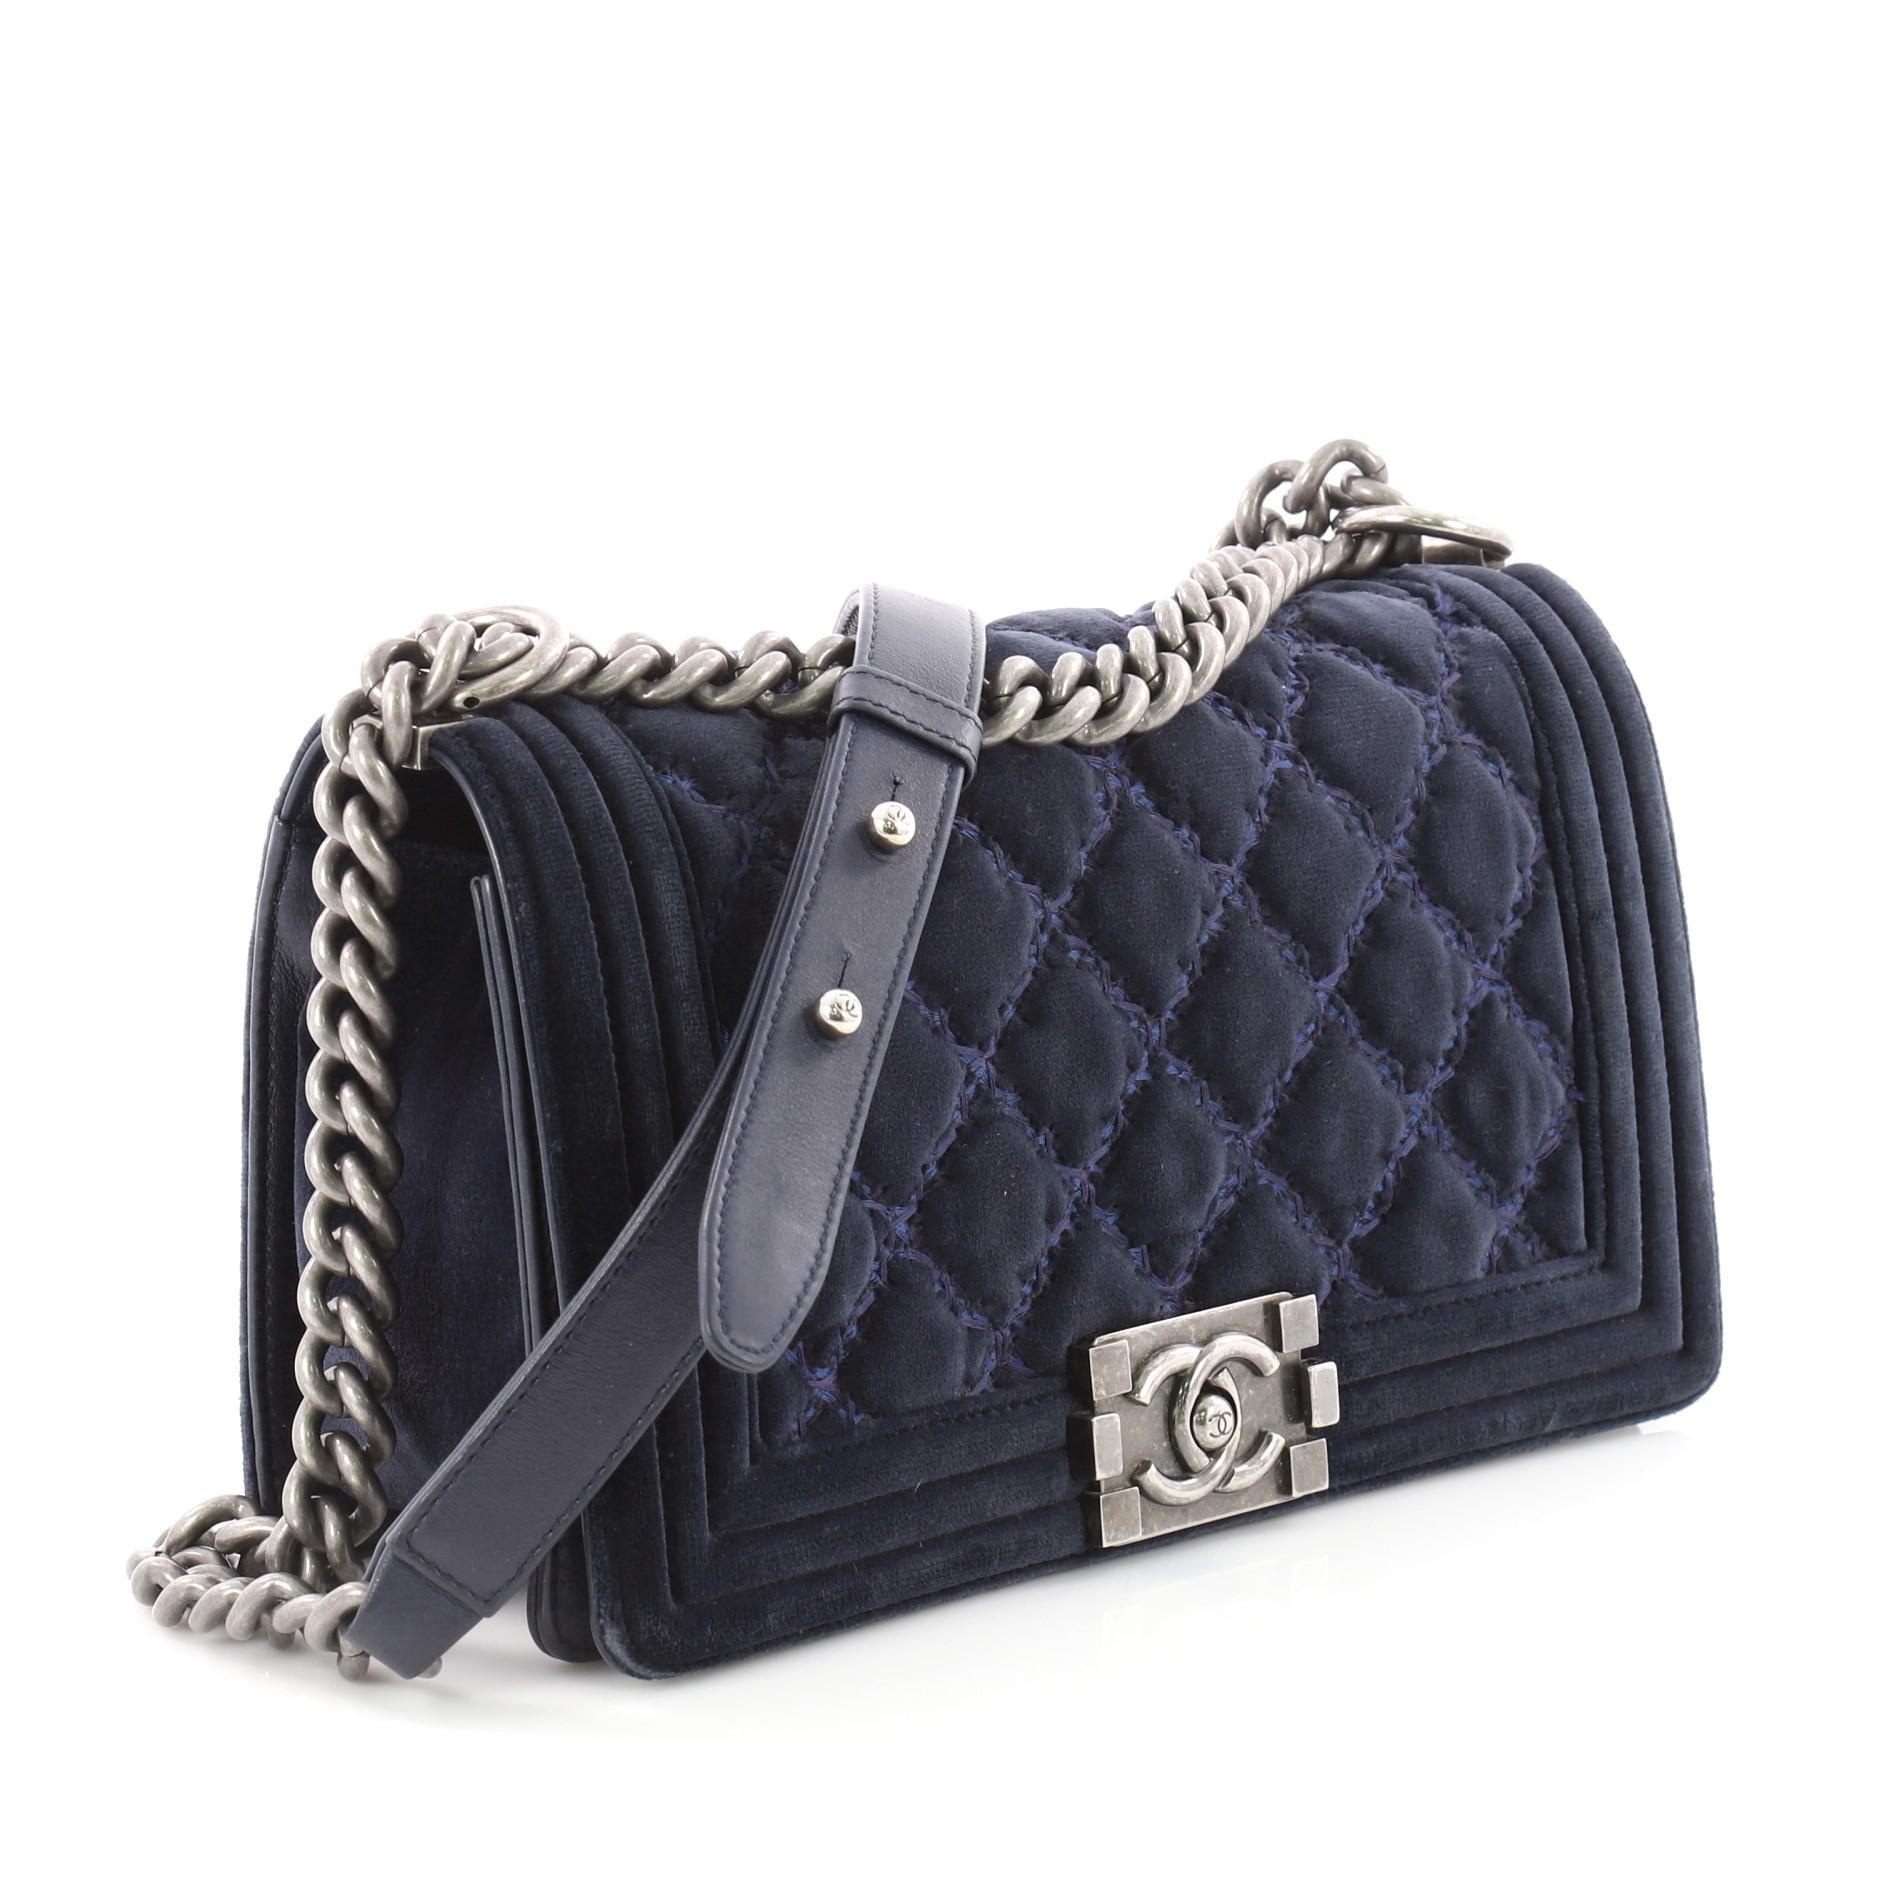 d1f6957a6e5f91 Chanel Boy Flap Bag Quilted Velvet Old Medium at 1stdibs